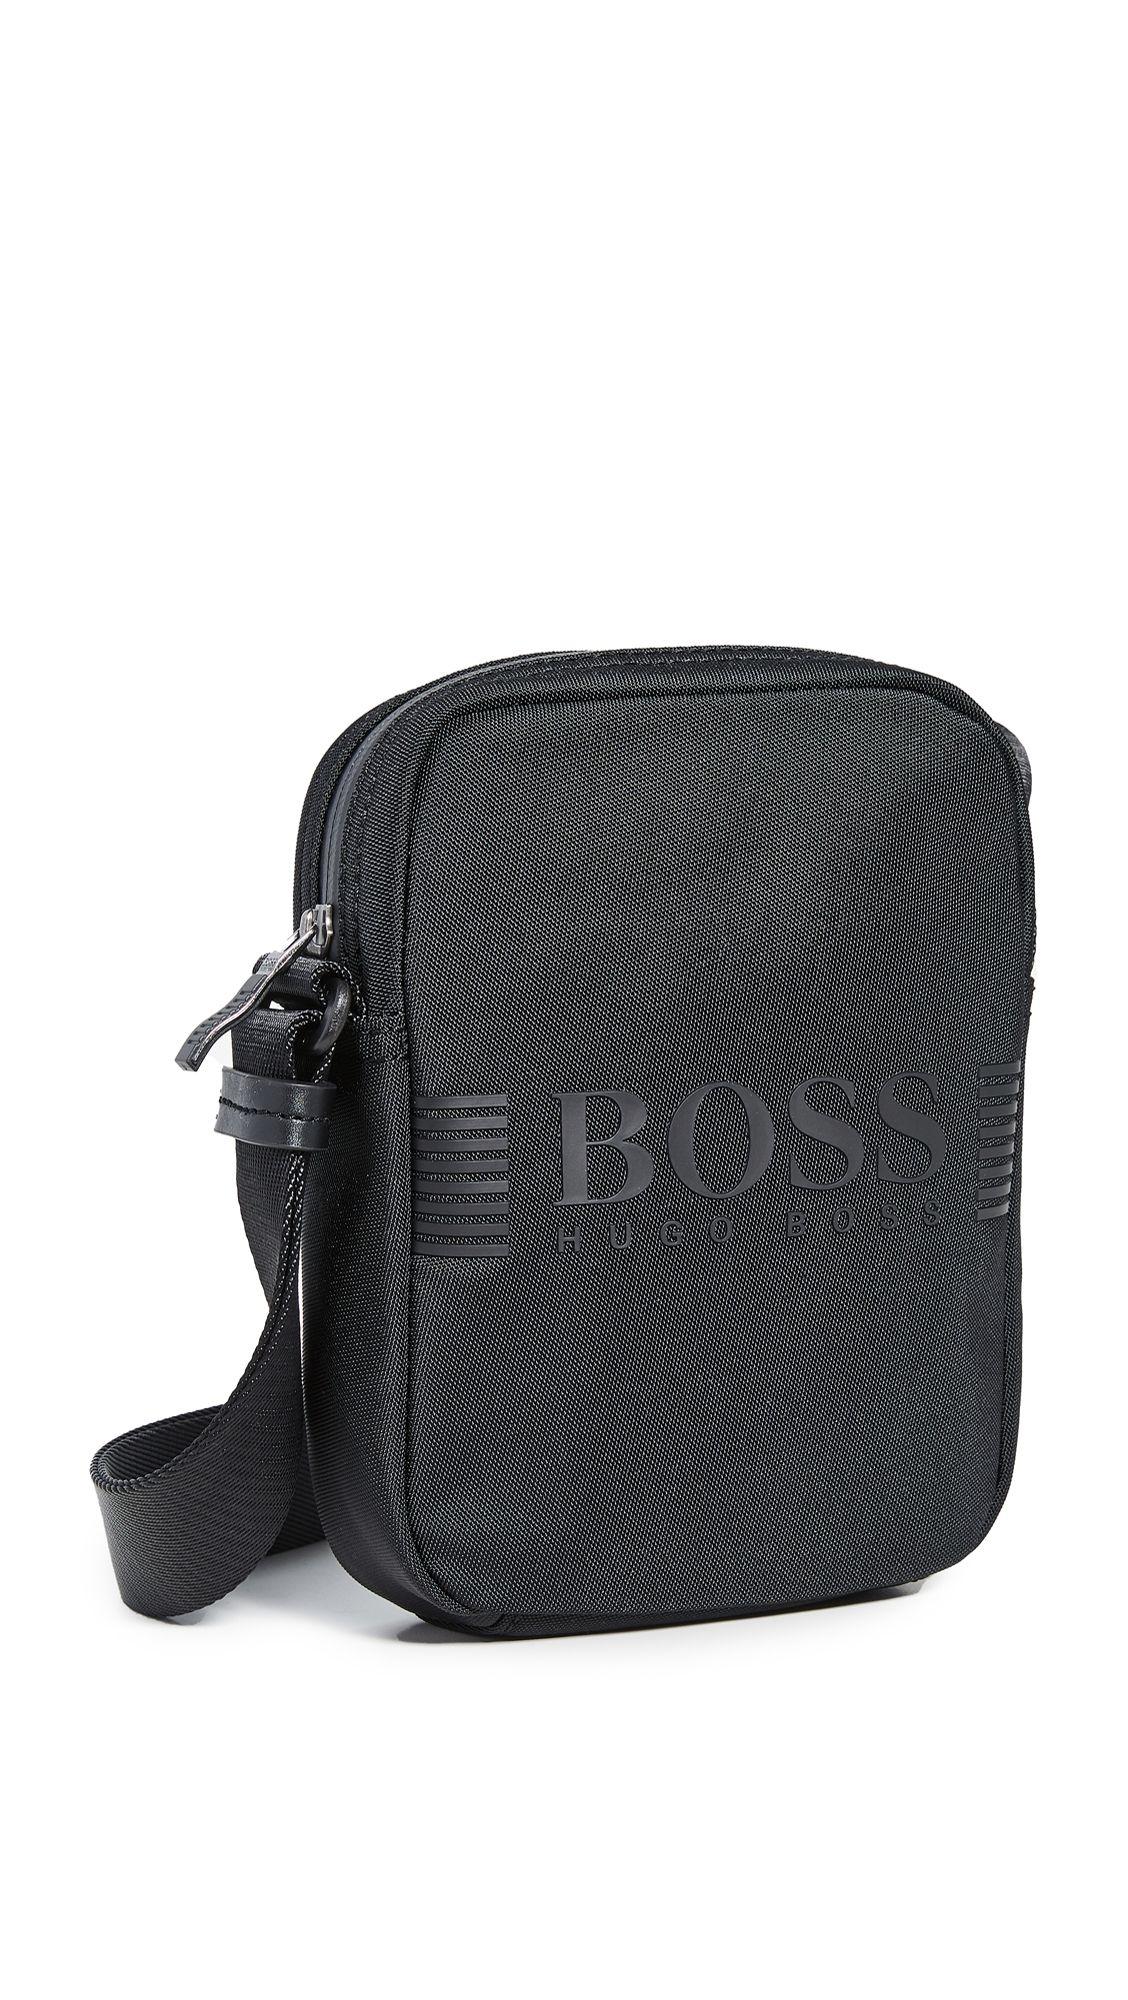 0ea0e08619 BOSS HUGO BOSS PIXEL NYLON SMALL CROSSBODY BAG. #bosshugoboss #bags #shoulder  bags